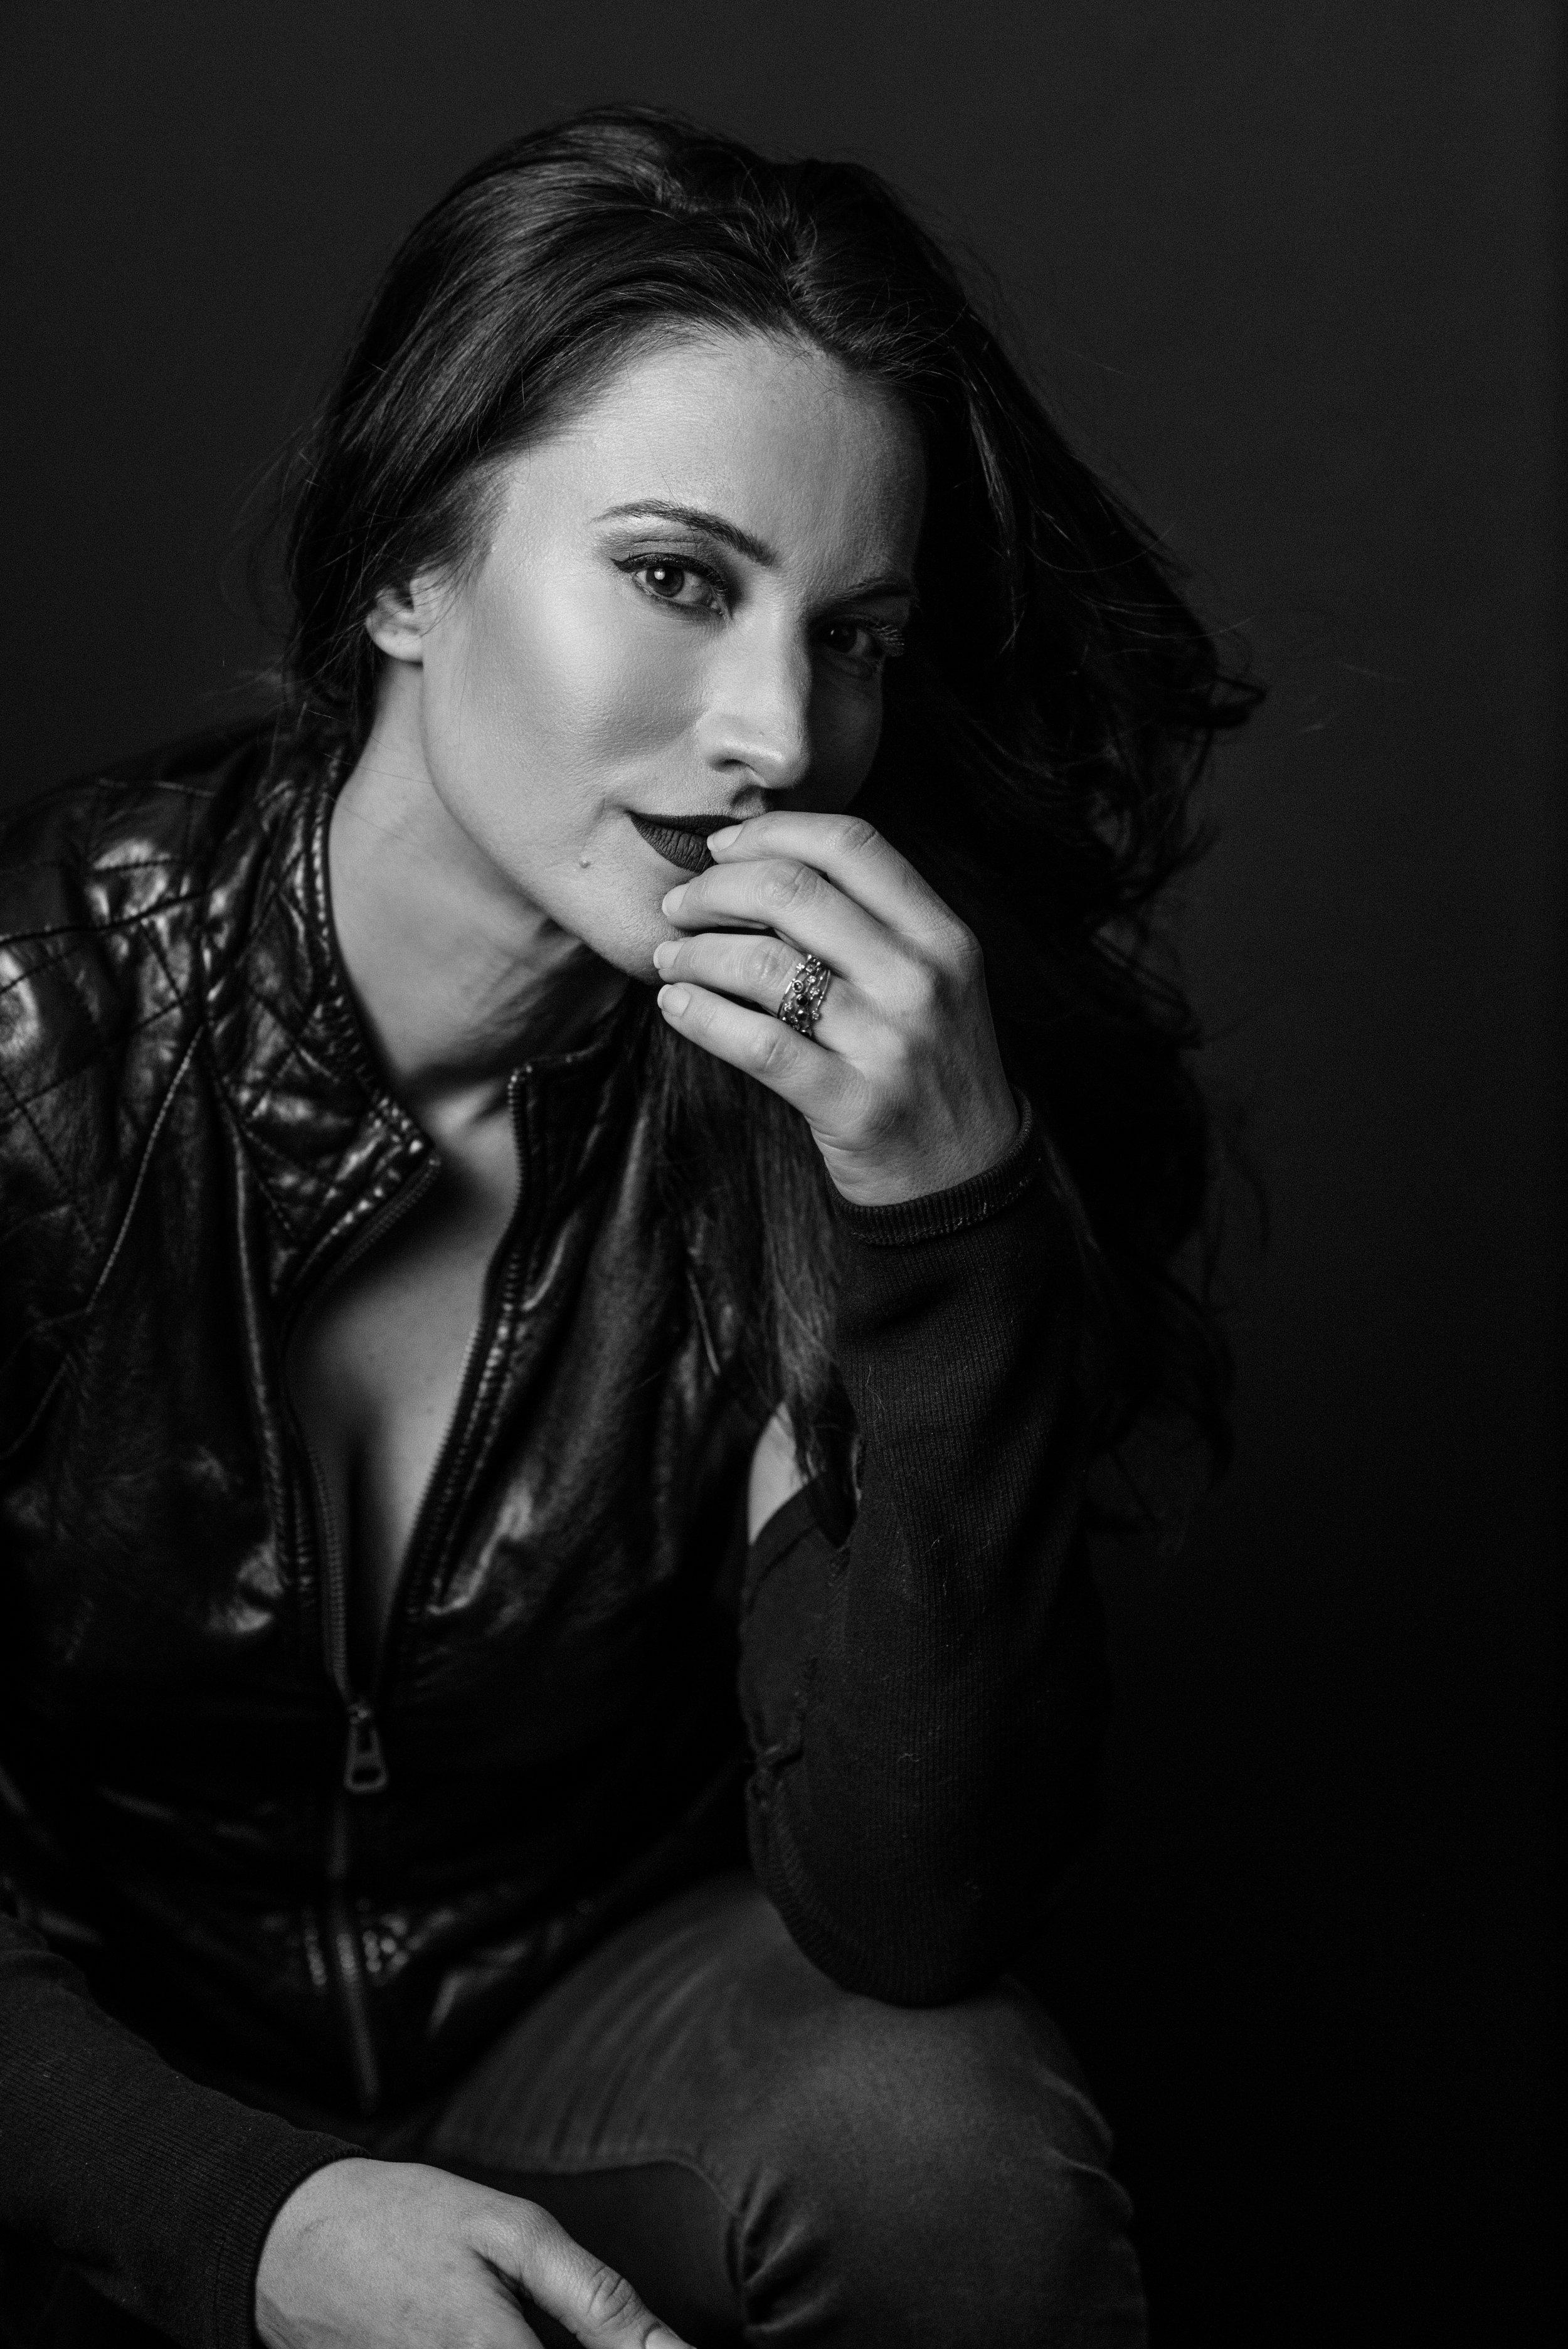 America Olivo - Michelle Kinney Photography.jpg